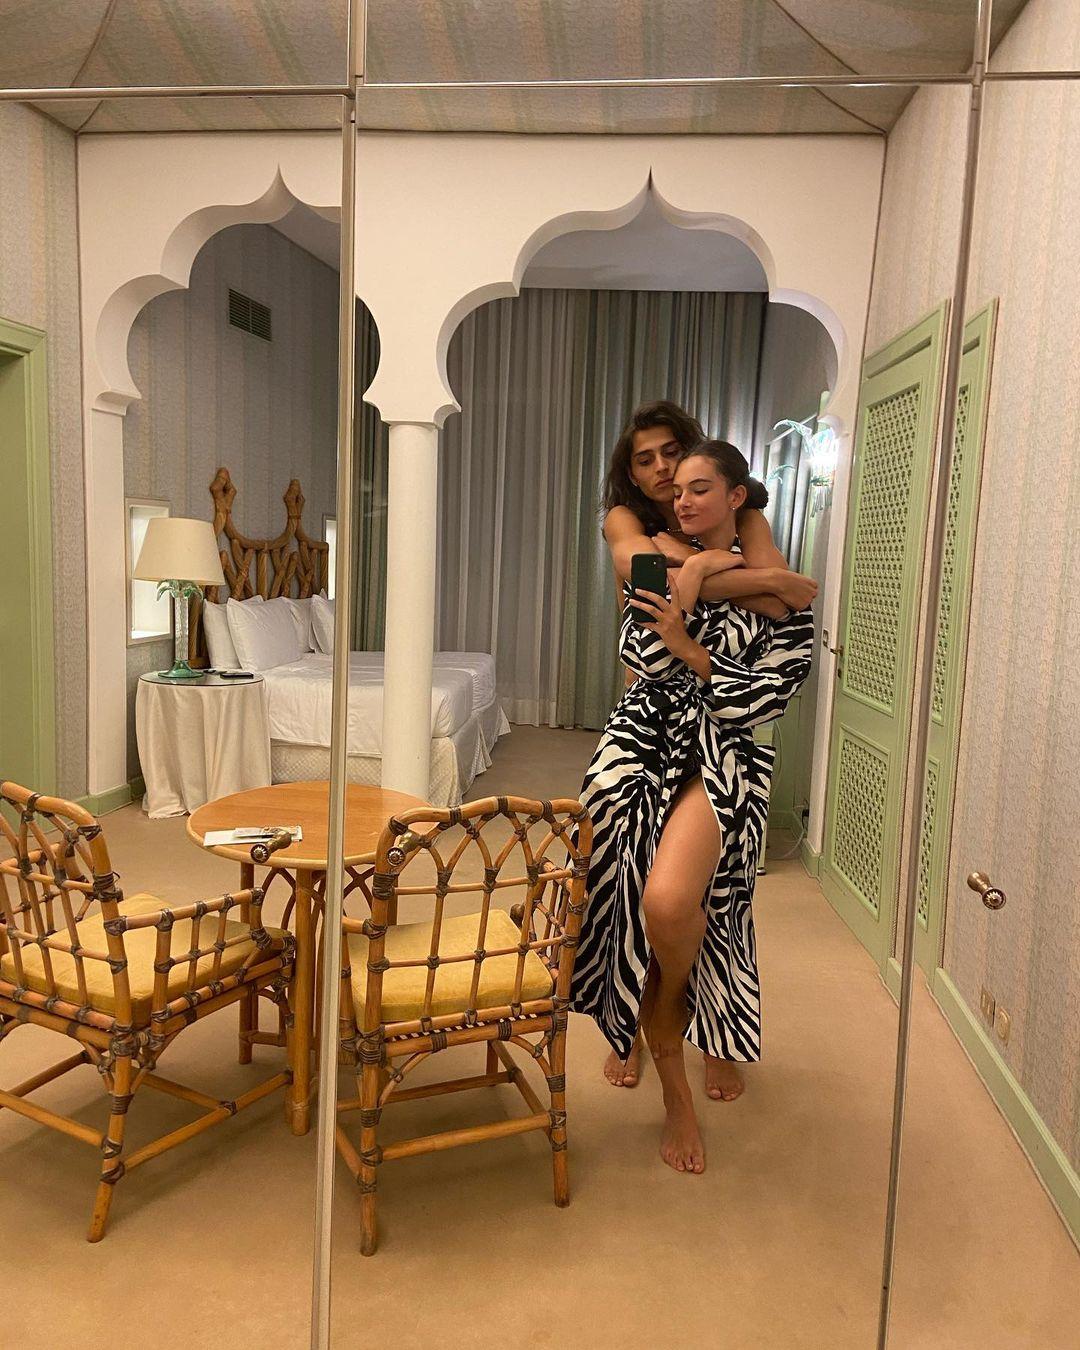 Virgo Kassel rests in Venice in the arms of her boyfriend